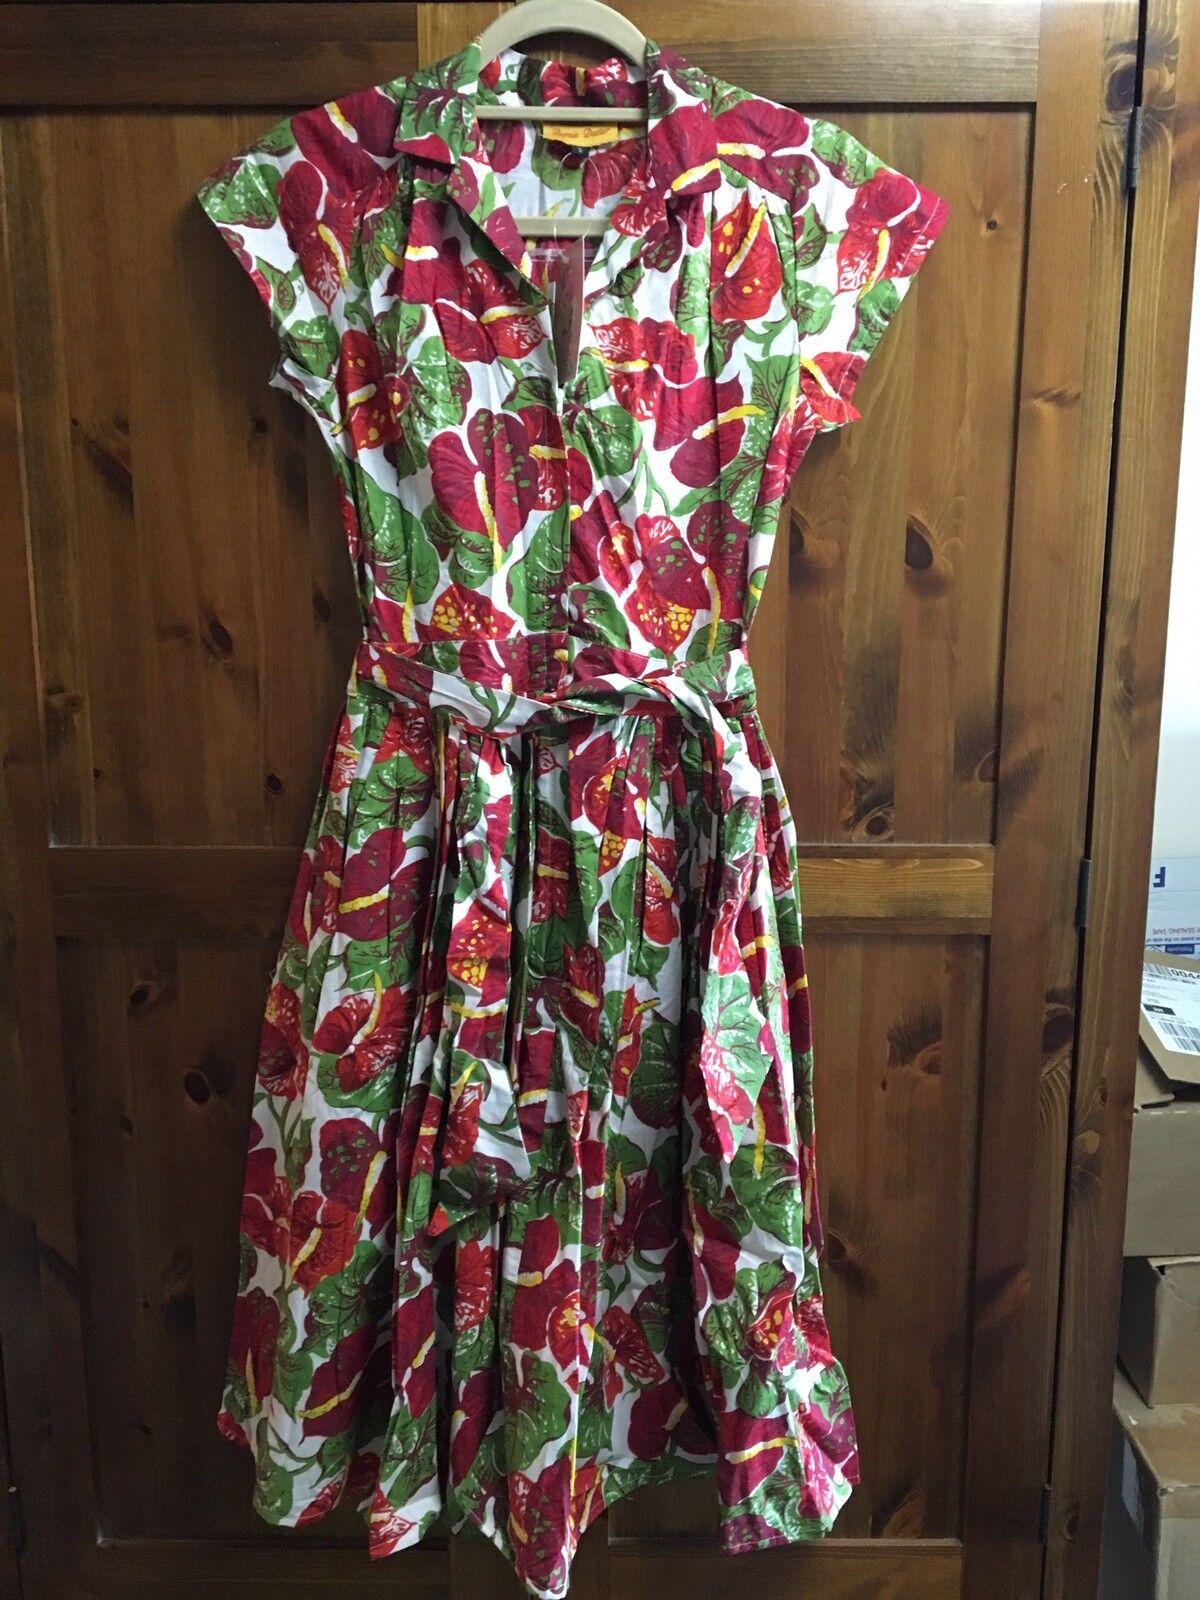 Bernie Dexter damen's Kelly Dress Größe S 8-10 Vintage rot Anthurium Floral Print